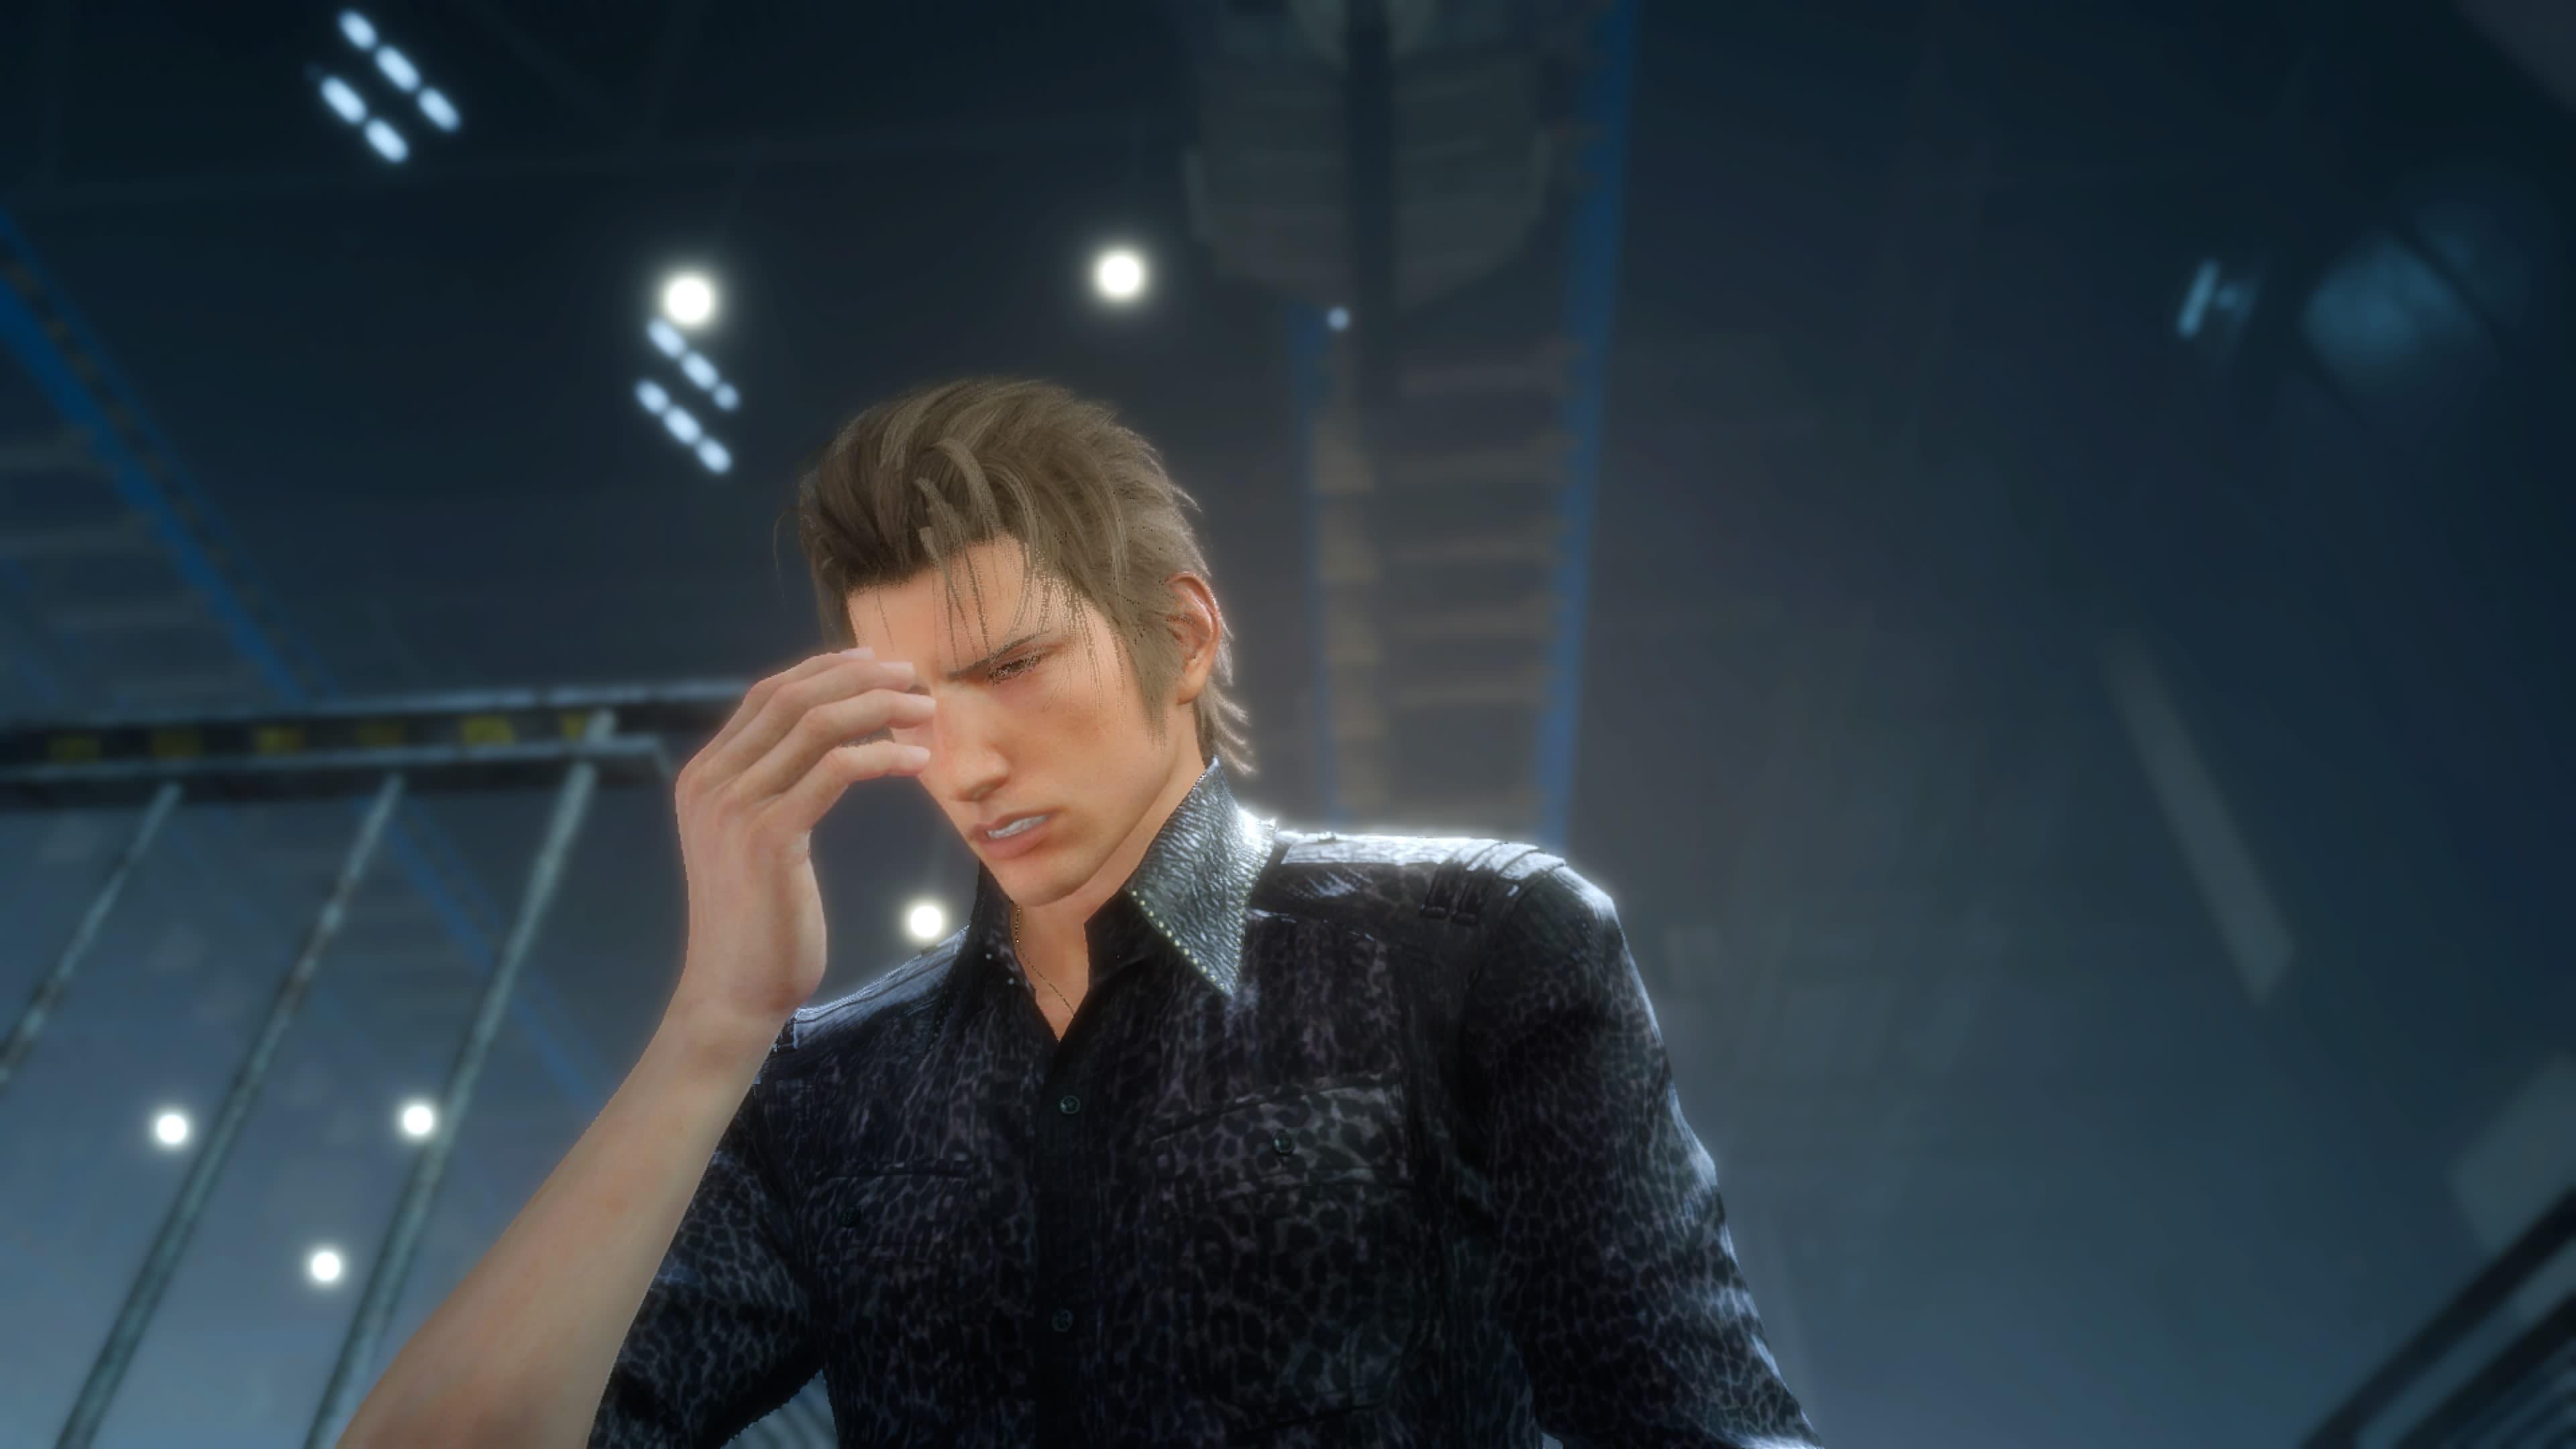 Final Fantasy XV - Episode Ignis Xbox